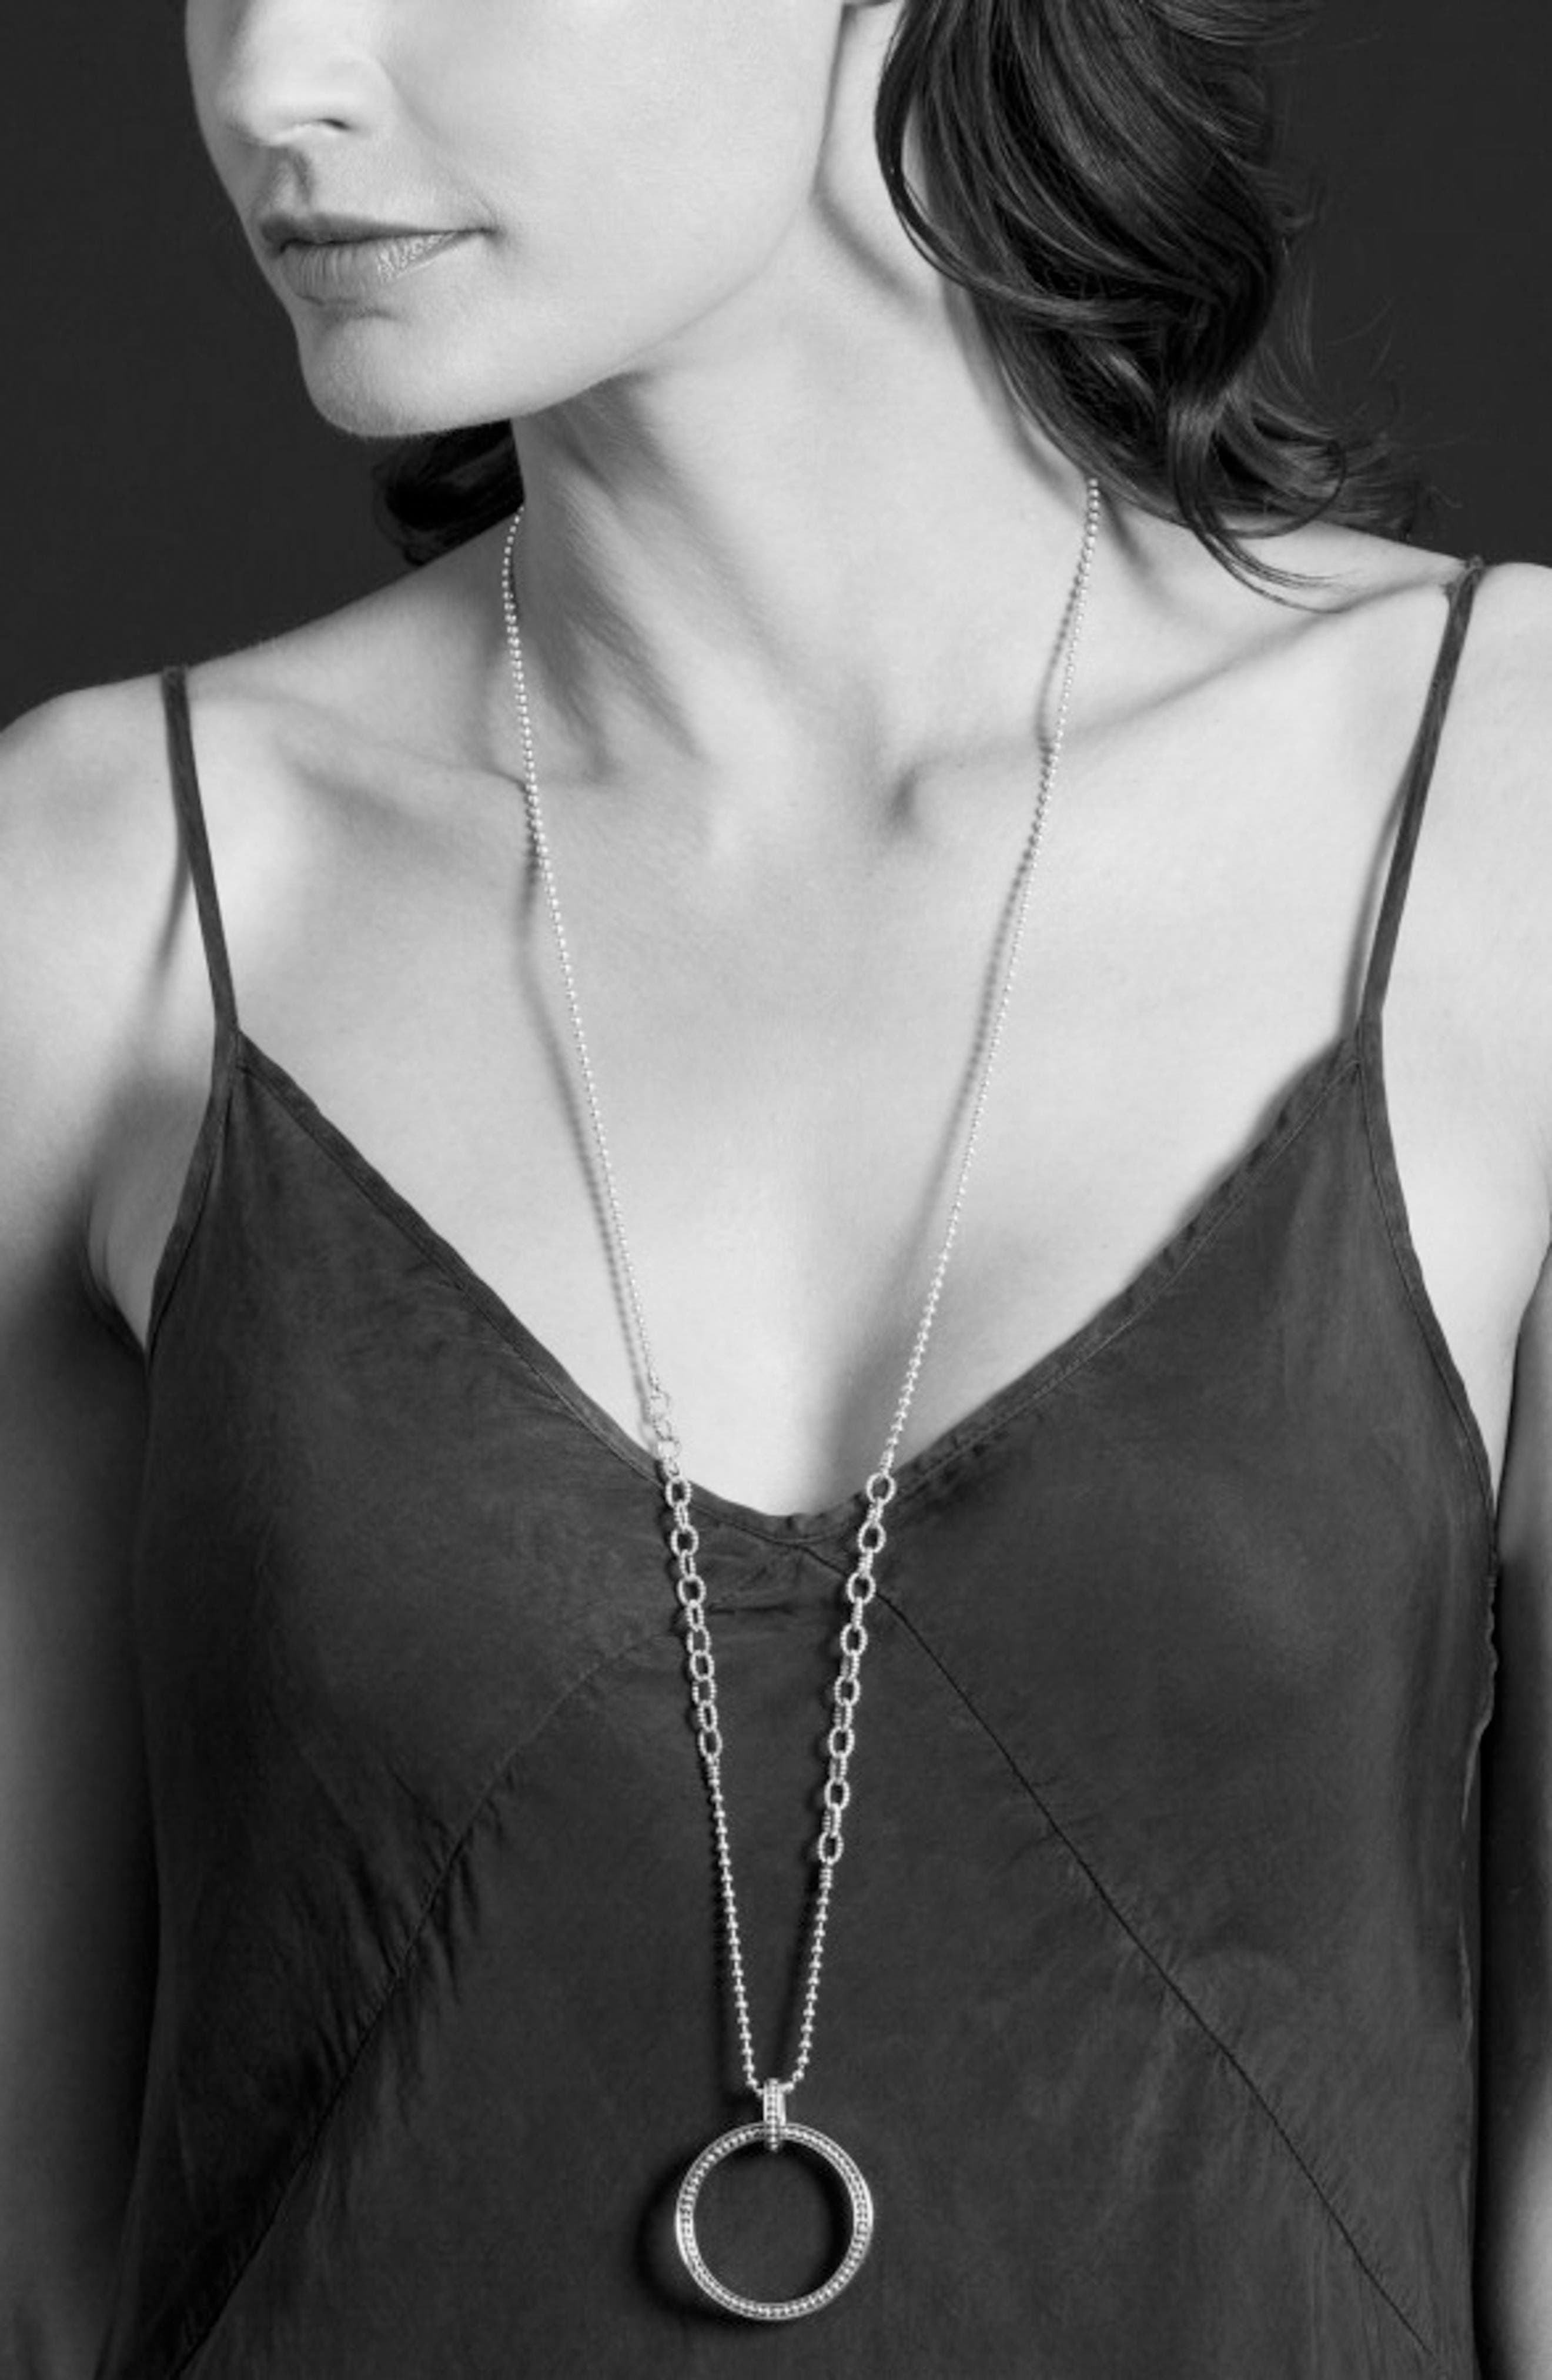 Enso Long Pendant Necklace,                             Alternate thumbnail 3, color,                             Silver/ Gold